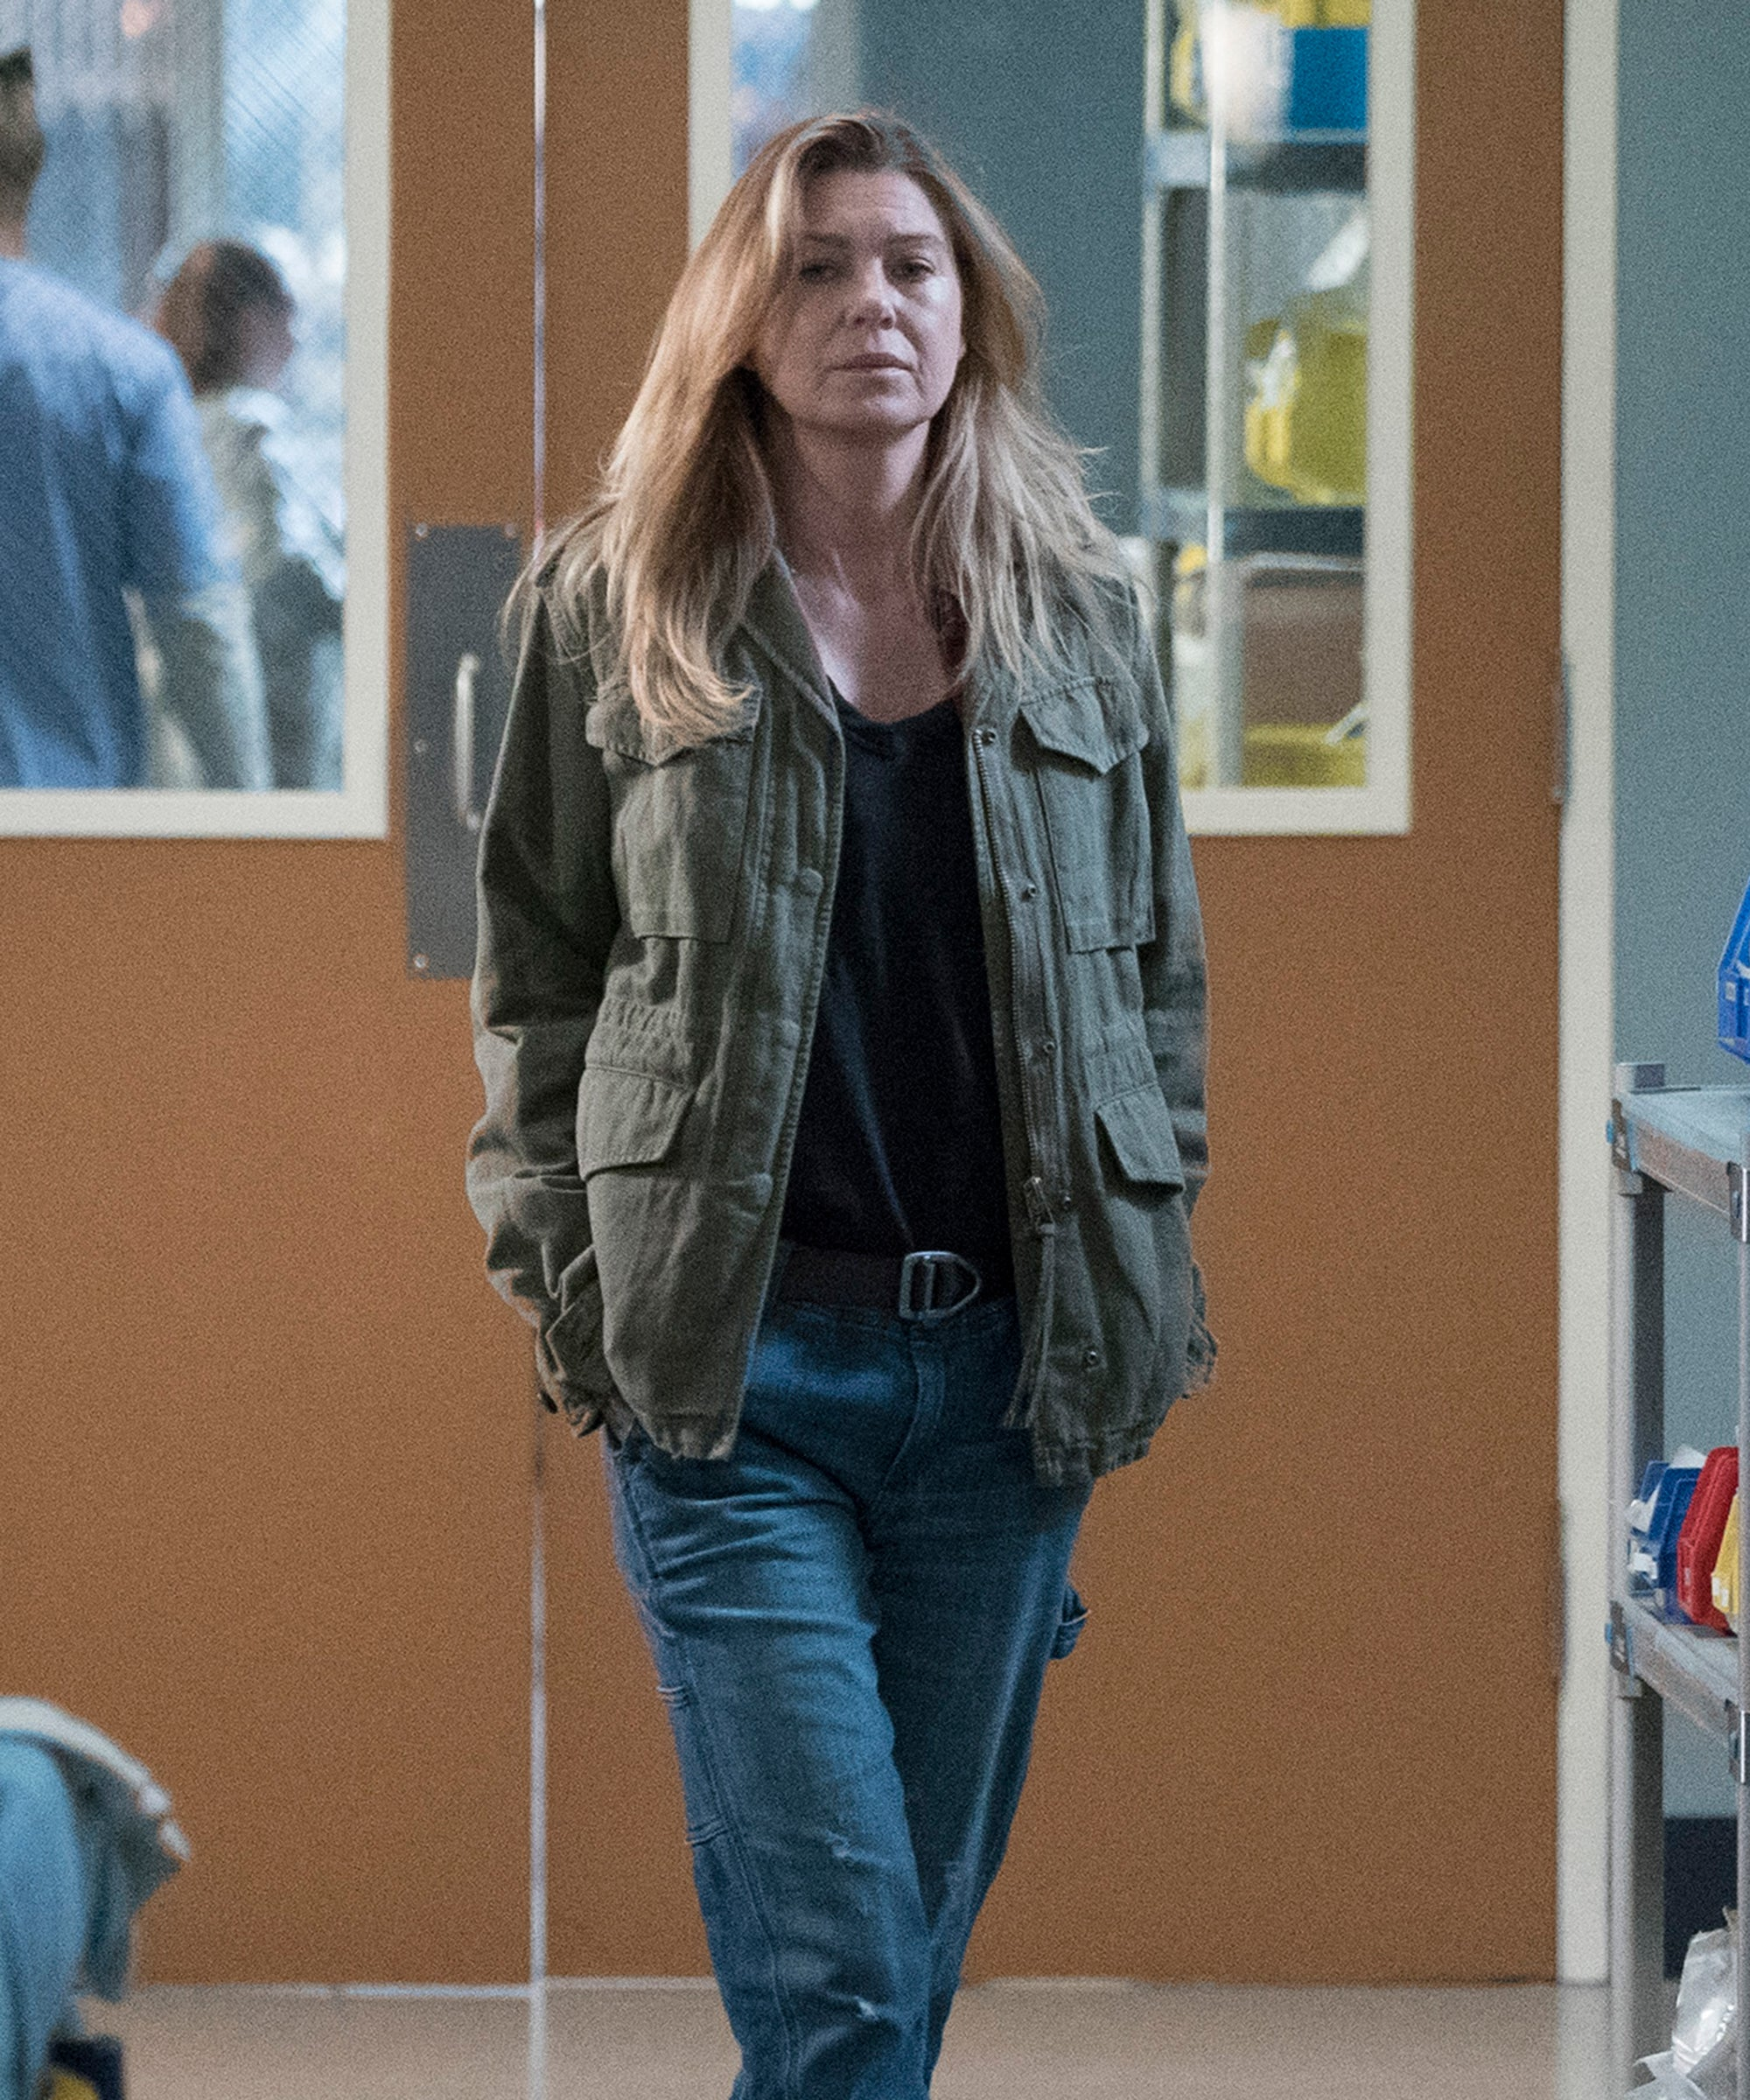 Grey's Anatomy Season 16, Episode 2 Recap: A Whole New World